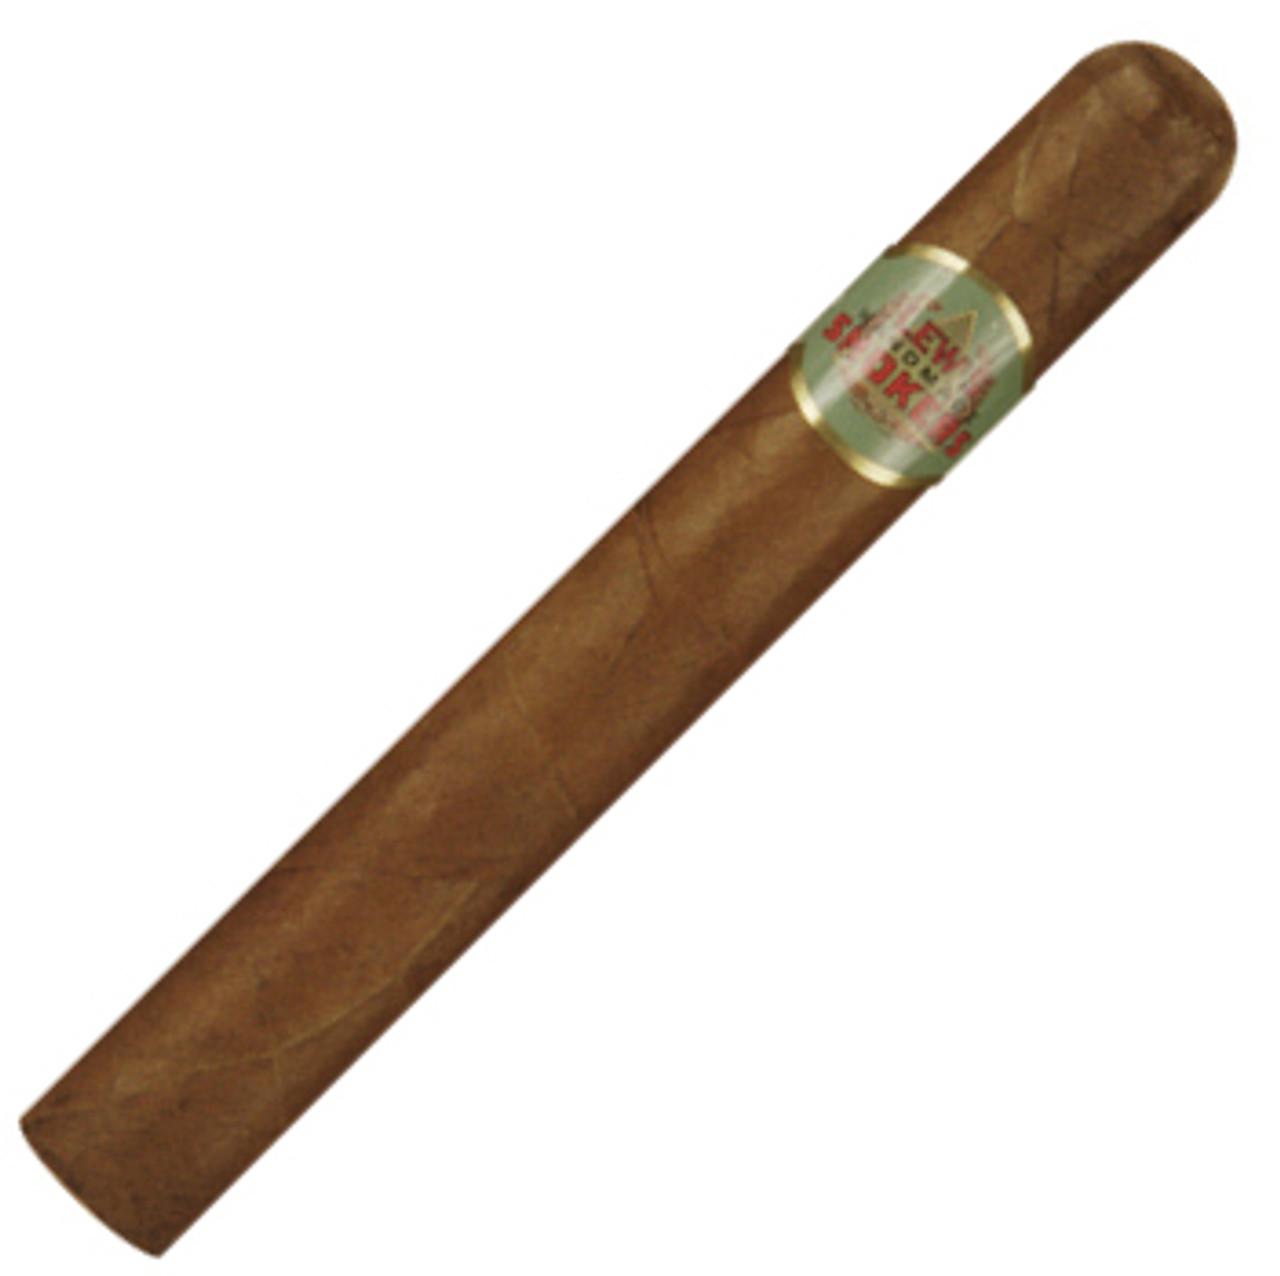 Lew's Handmade Smokers No. 500 Long Filler Cigars - 6 x 50 (Bundle of 10)